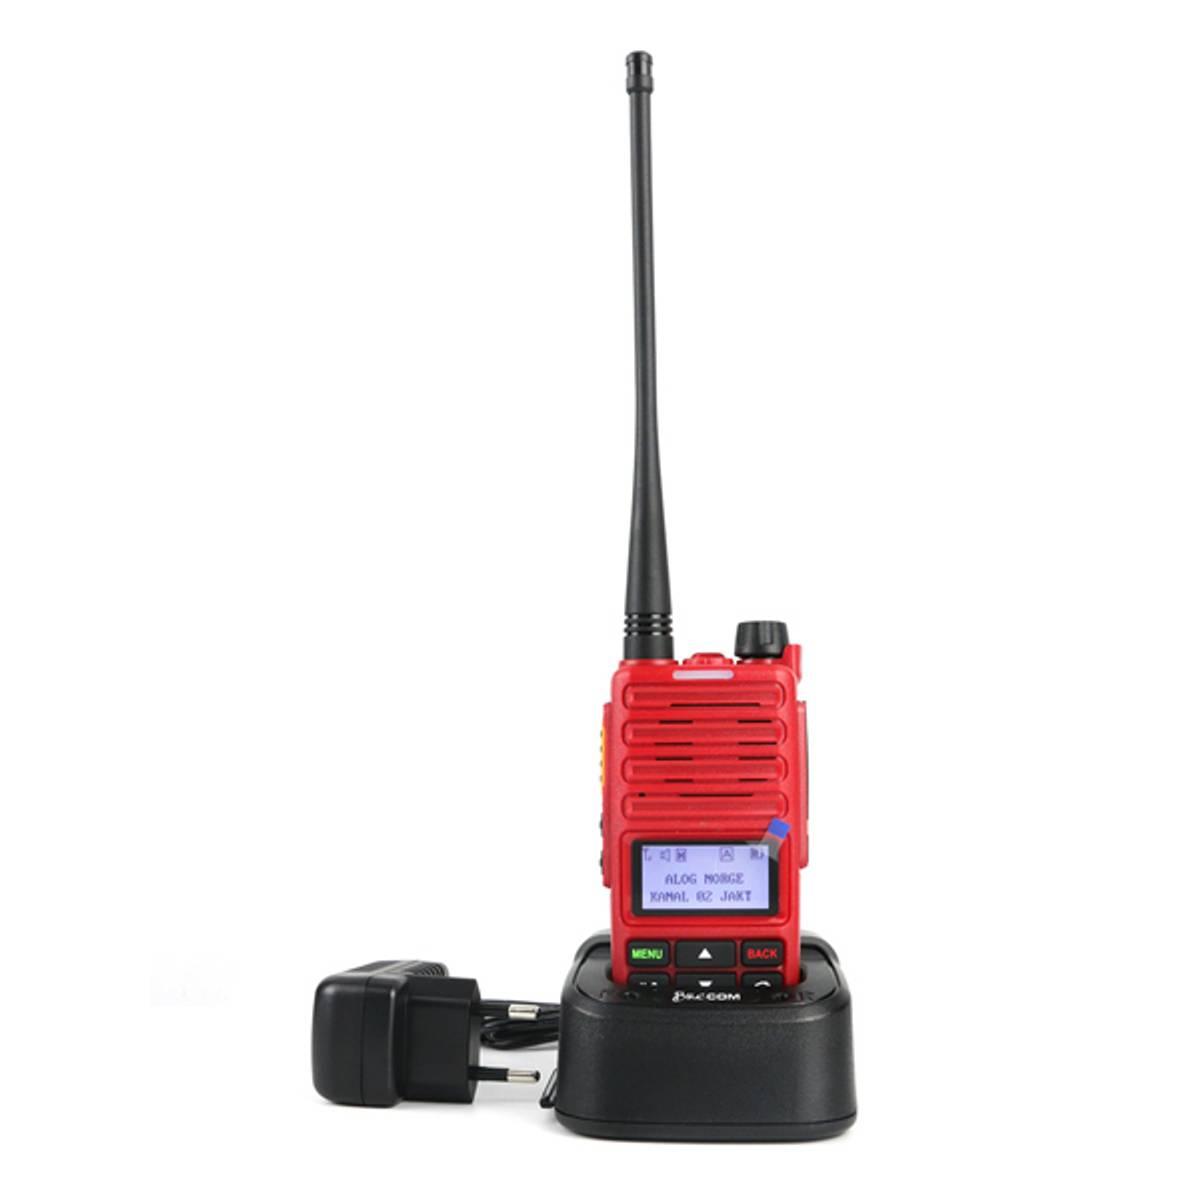 Brecom VR-600D analog/digital radio DMR 138-174Mhz